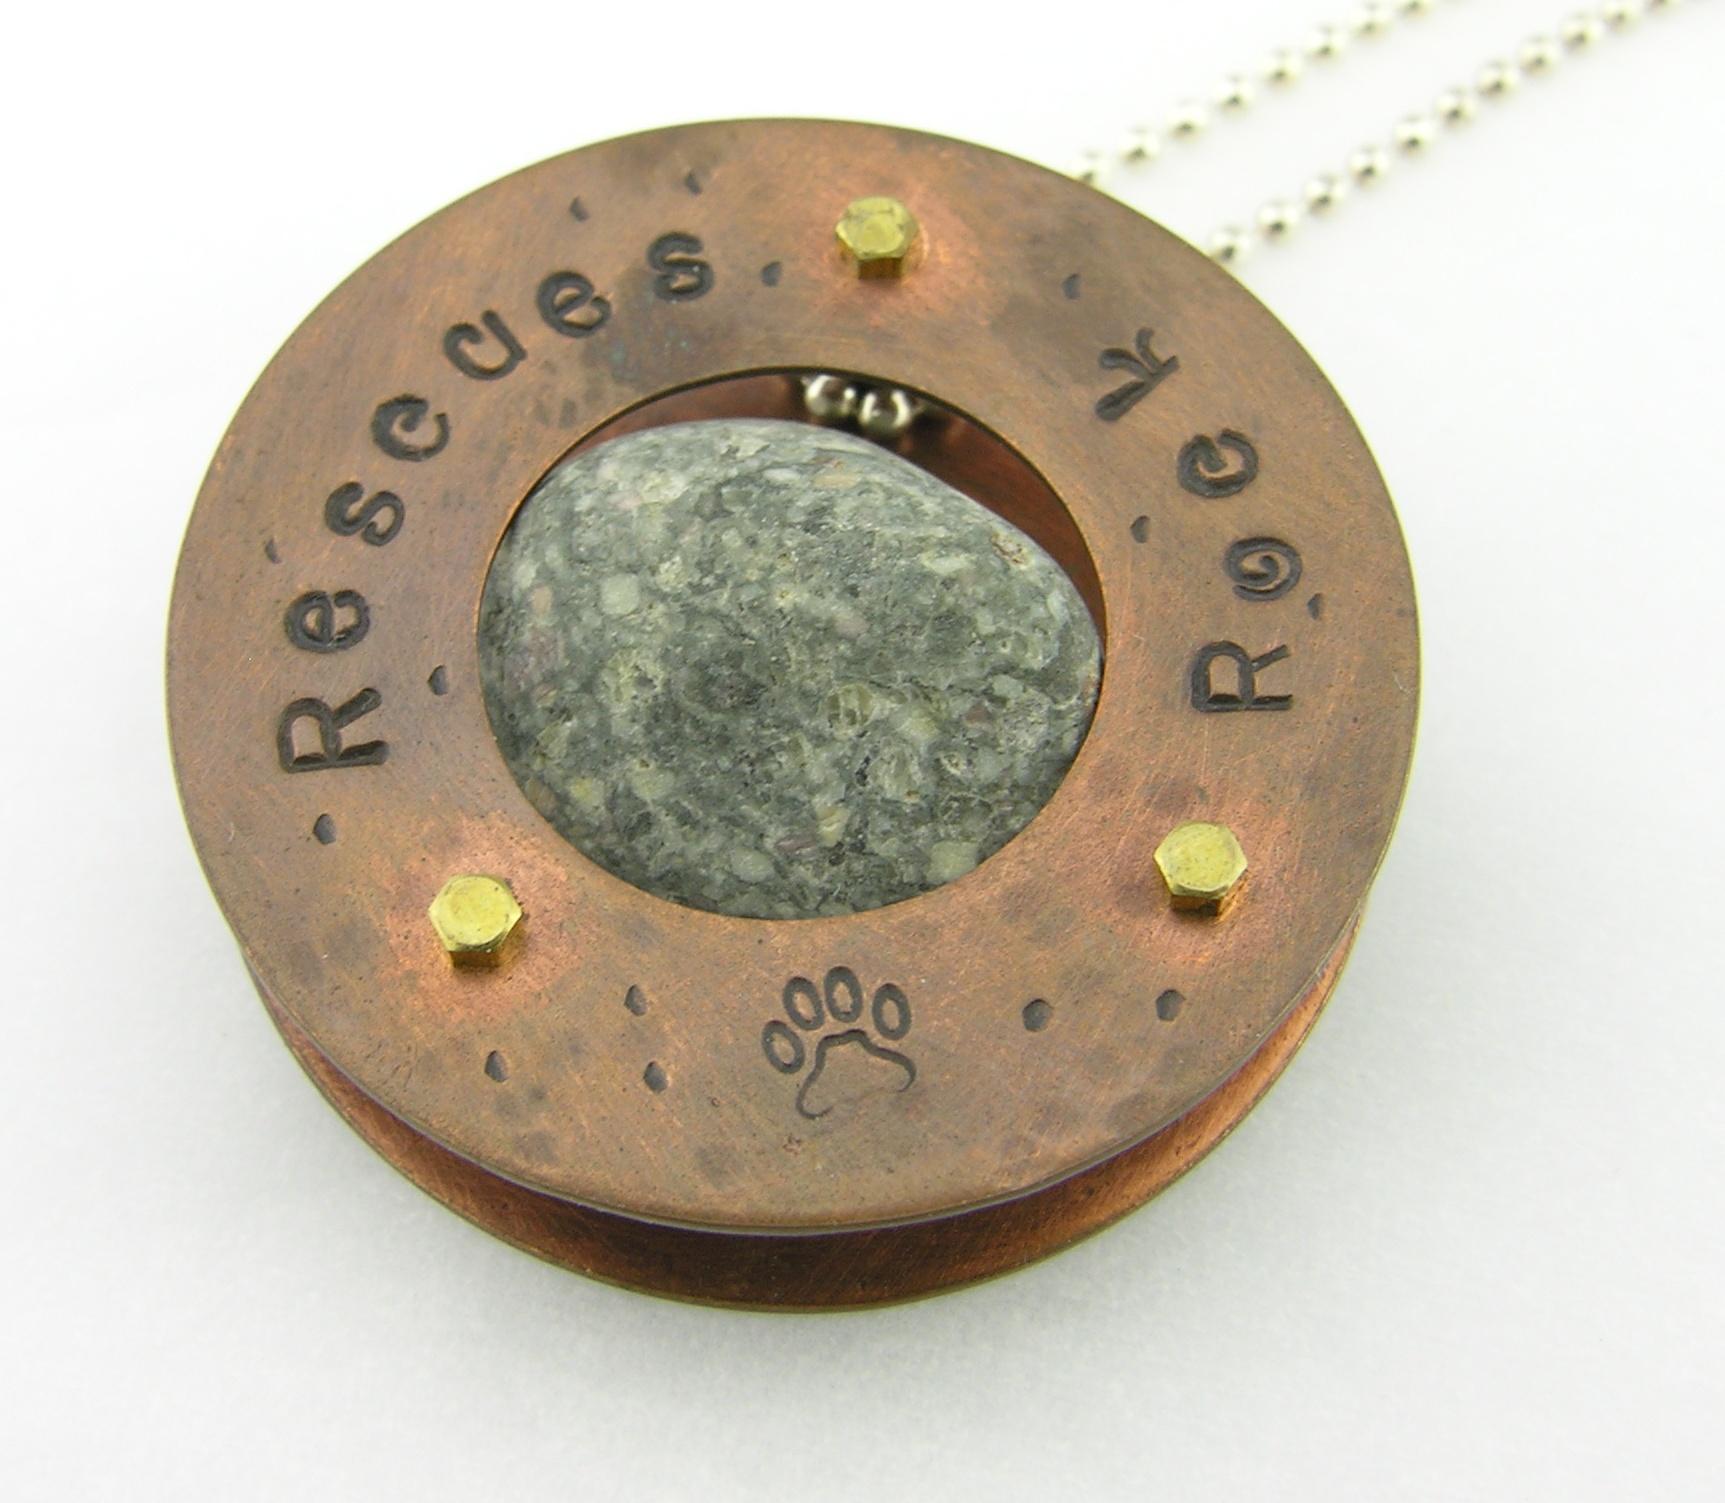 Mish Mesh Hooplets ERescues Rock Necklace - copper brass nut screw granite rivet artisan sterling silver animal dog cat paw srajd cserpentDesignsarrings - fused sterling silver filigree handmade artisan